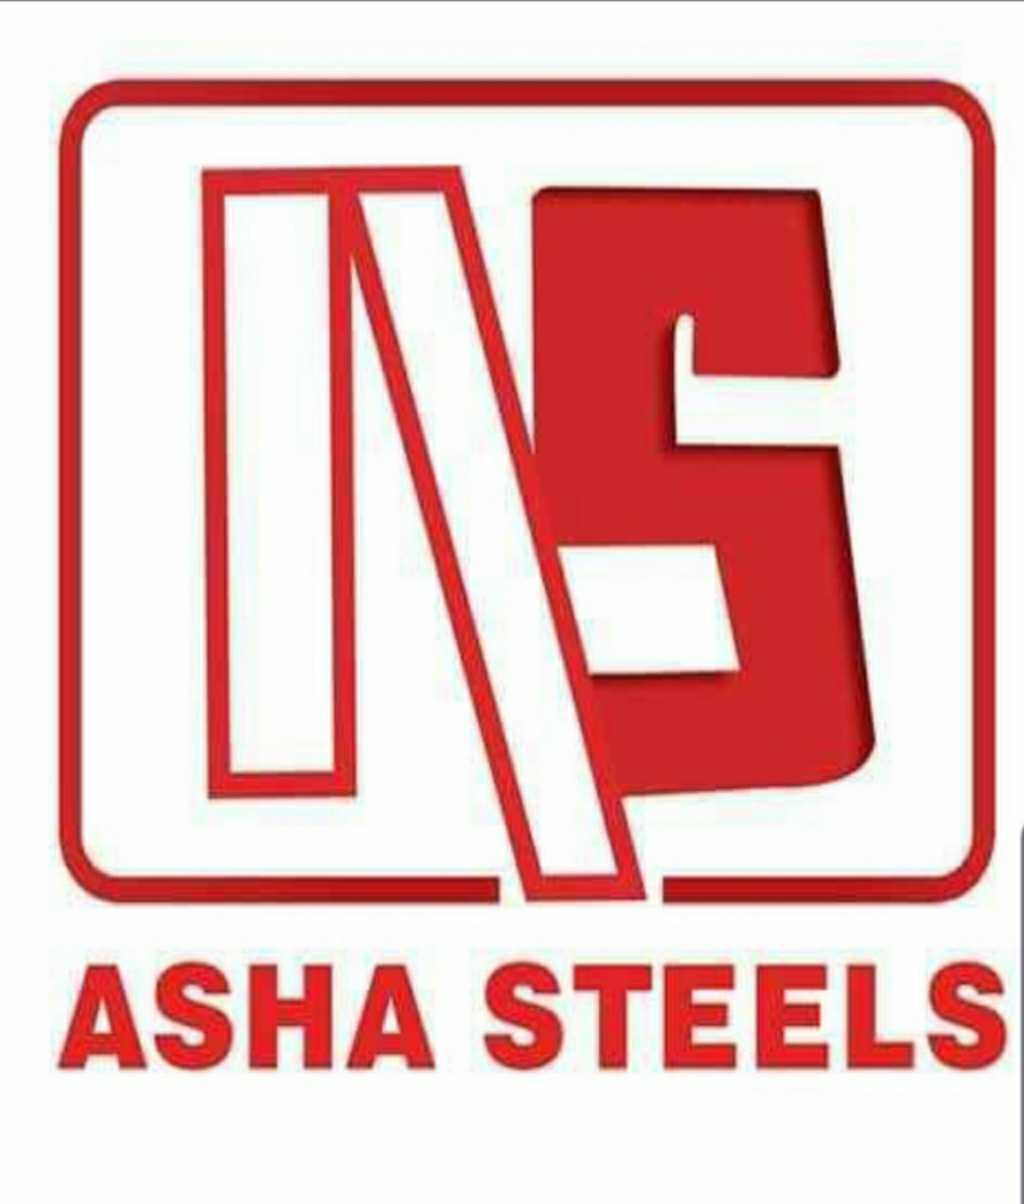 Asha Steels